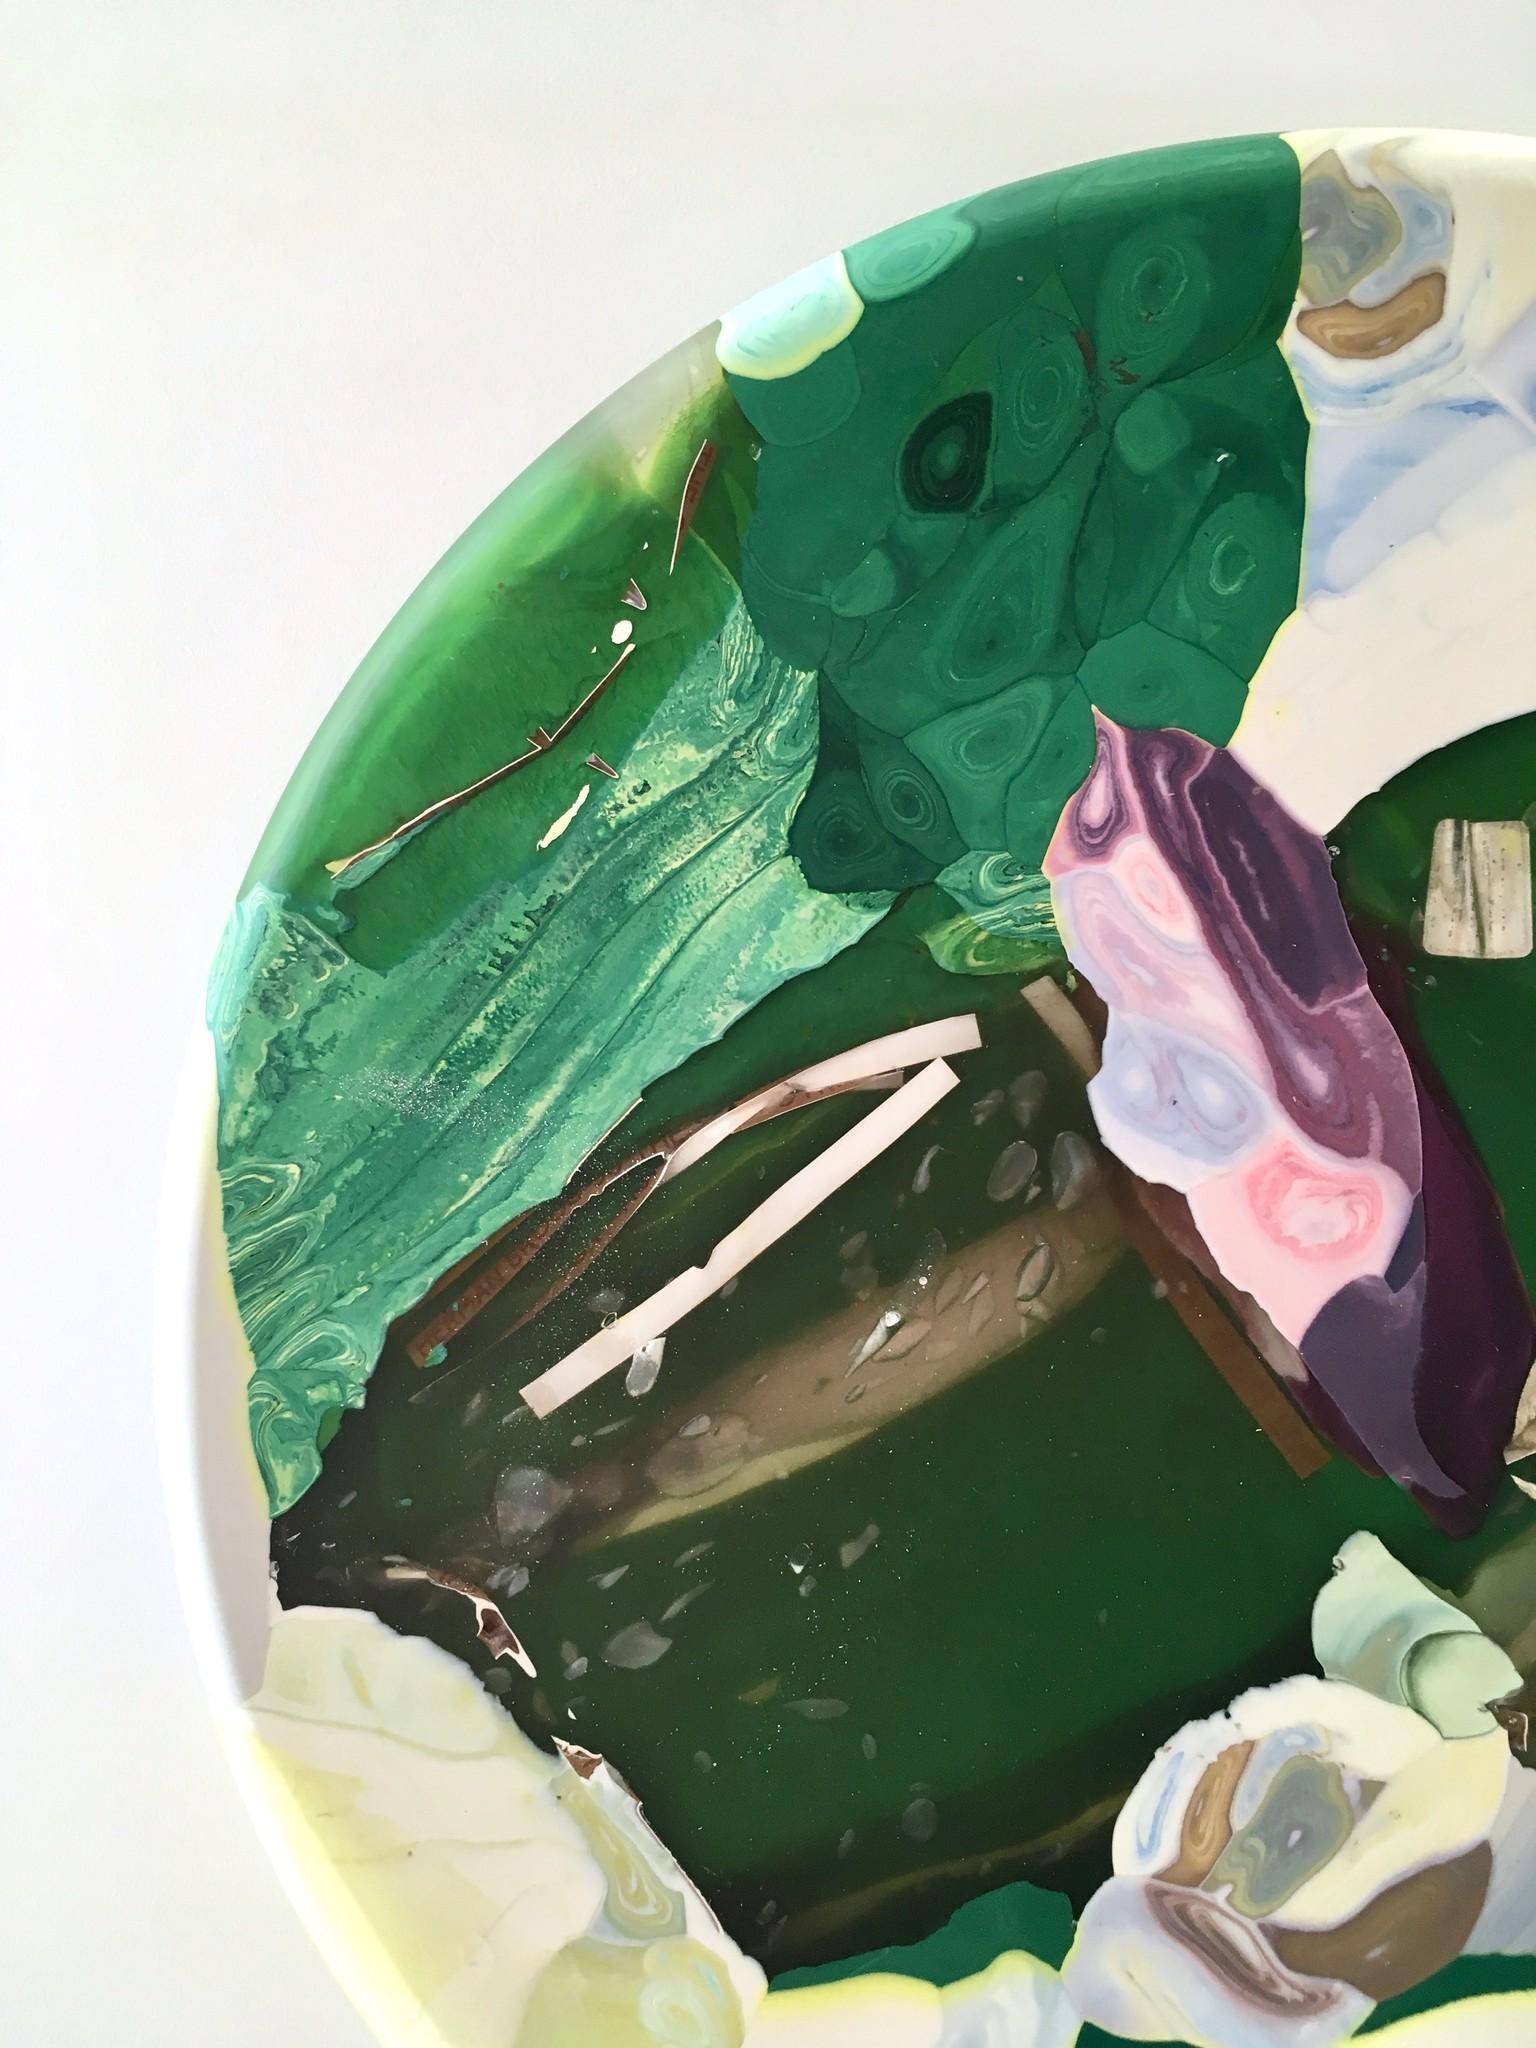 VAN DER KOOIJ | TIDE POOLS, 2019